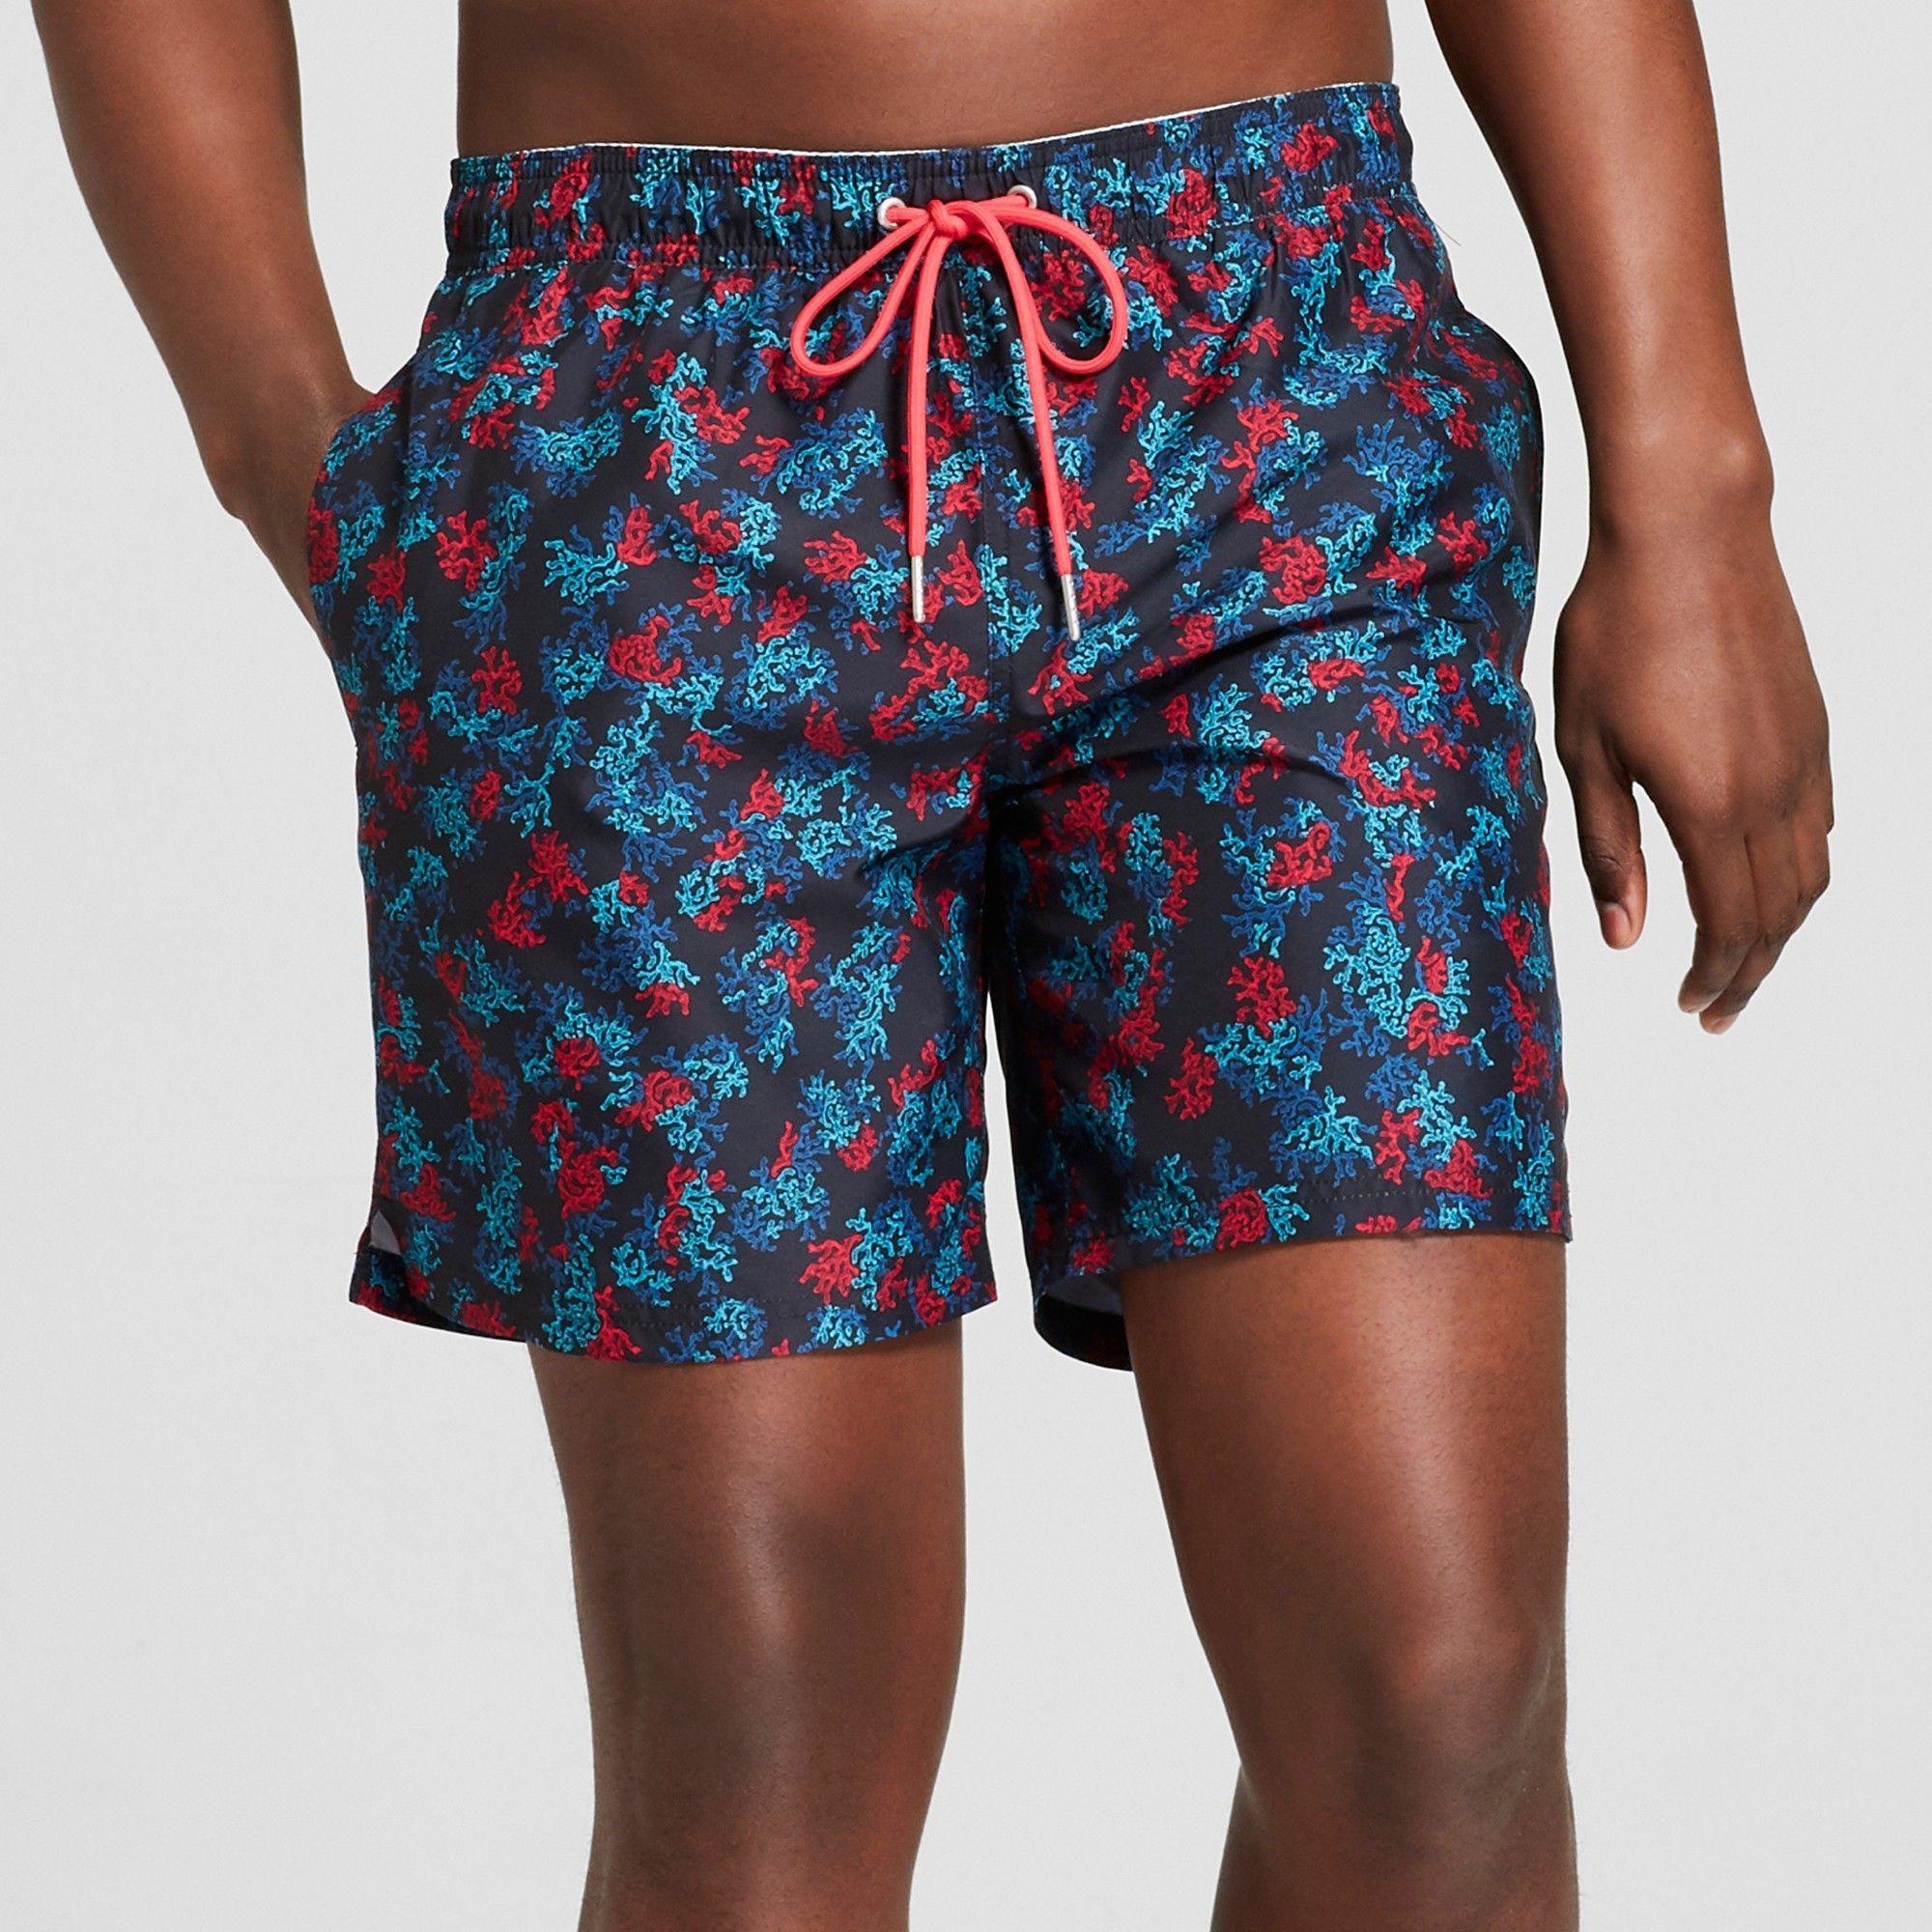 0ed802a50f Men's 7 Tropical Floral Print Swim Trunks - Goodfellow & Co Black M ...